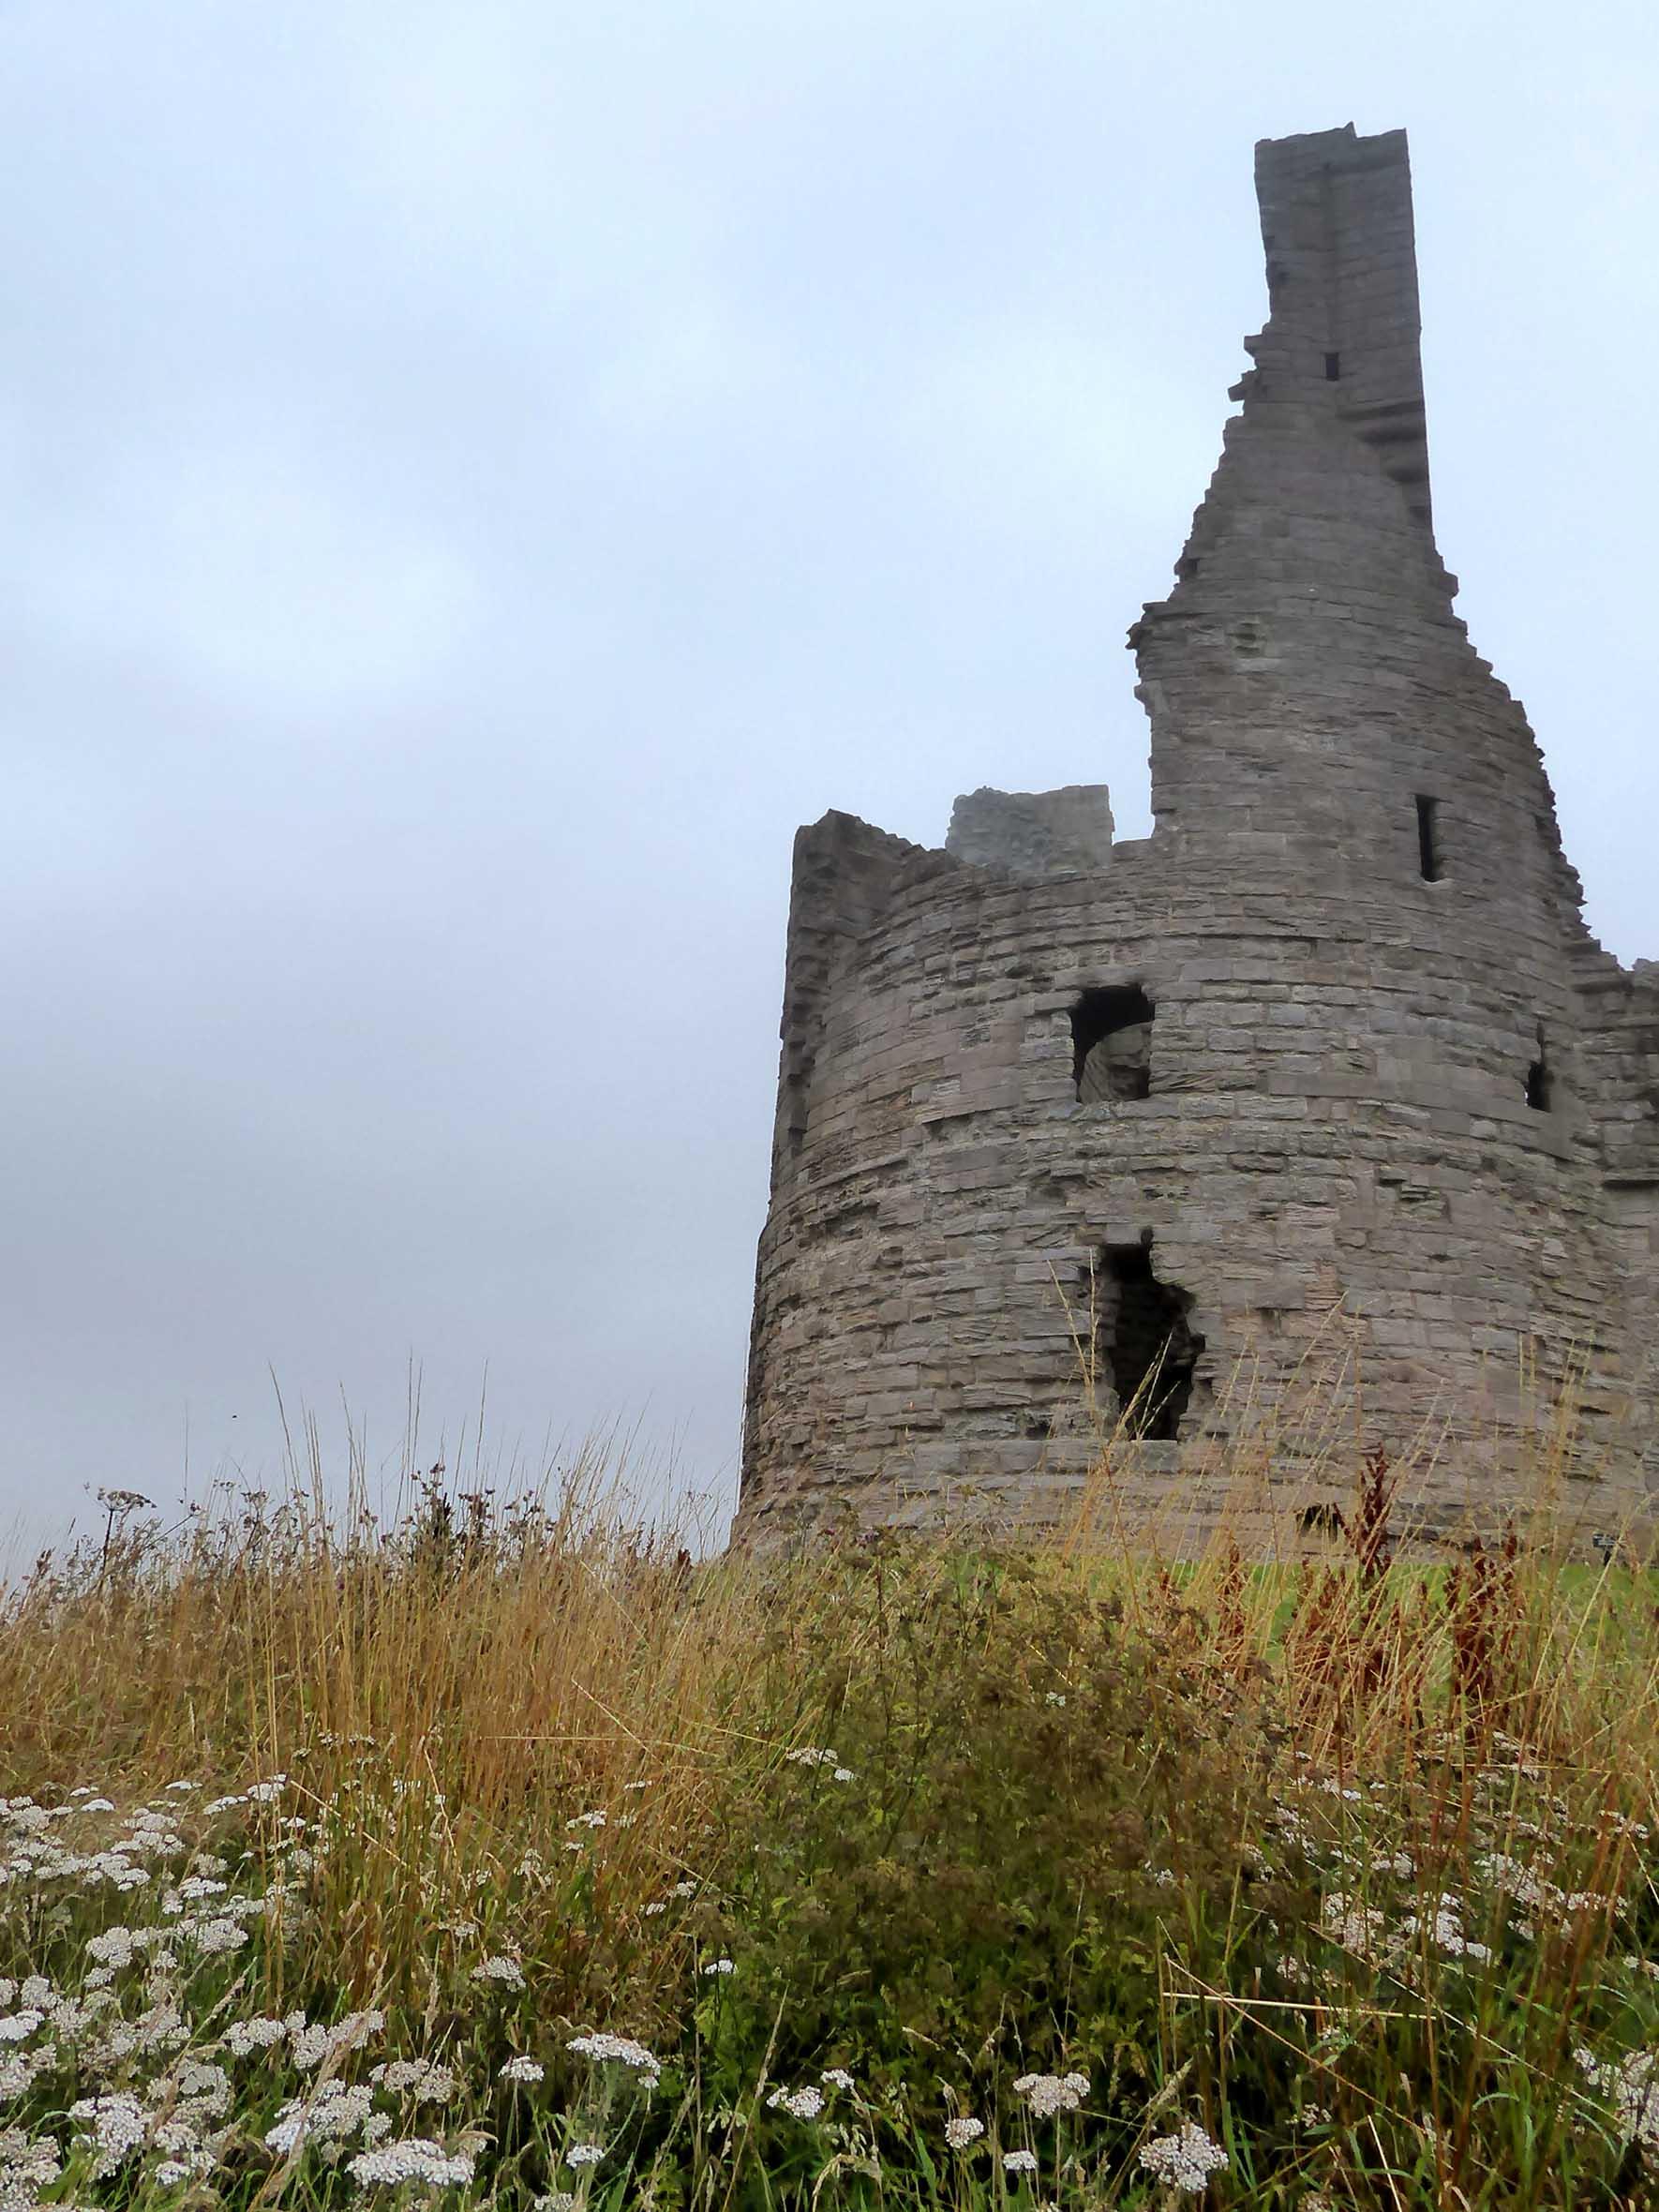 Castle ruins among long grass